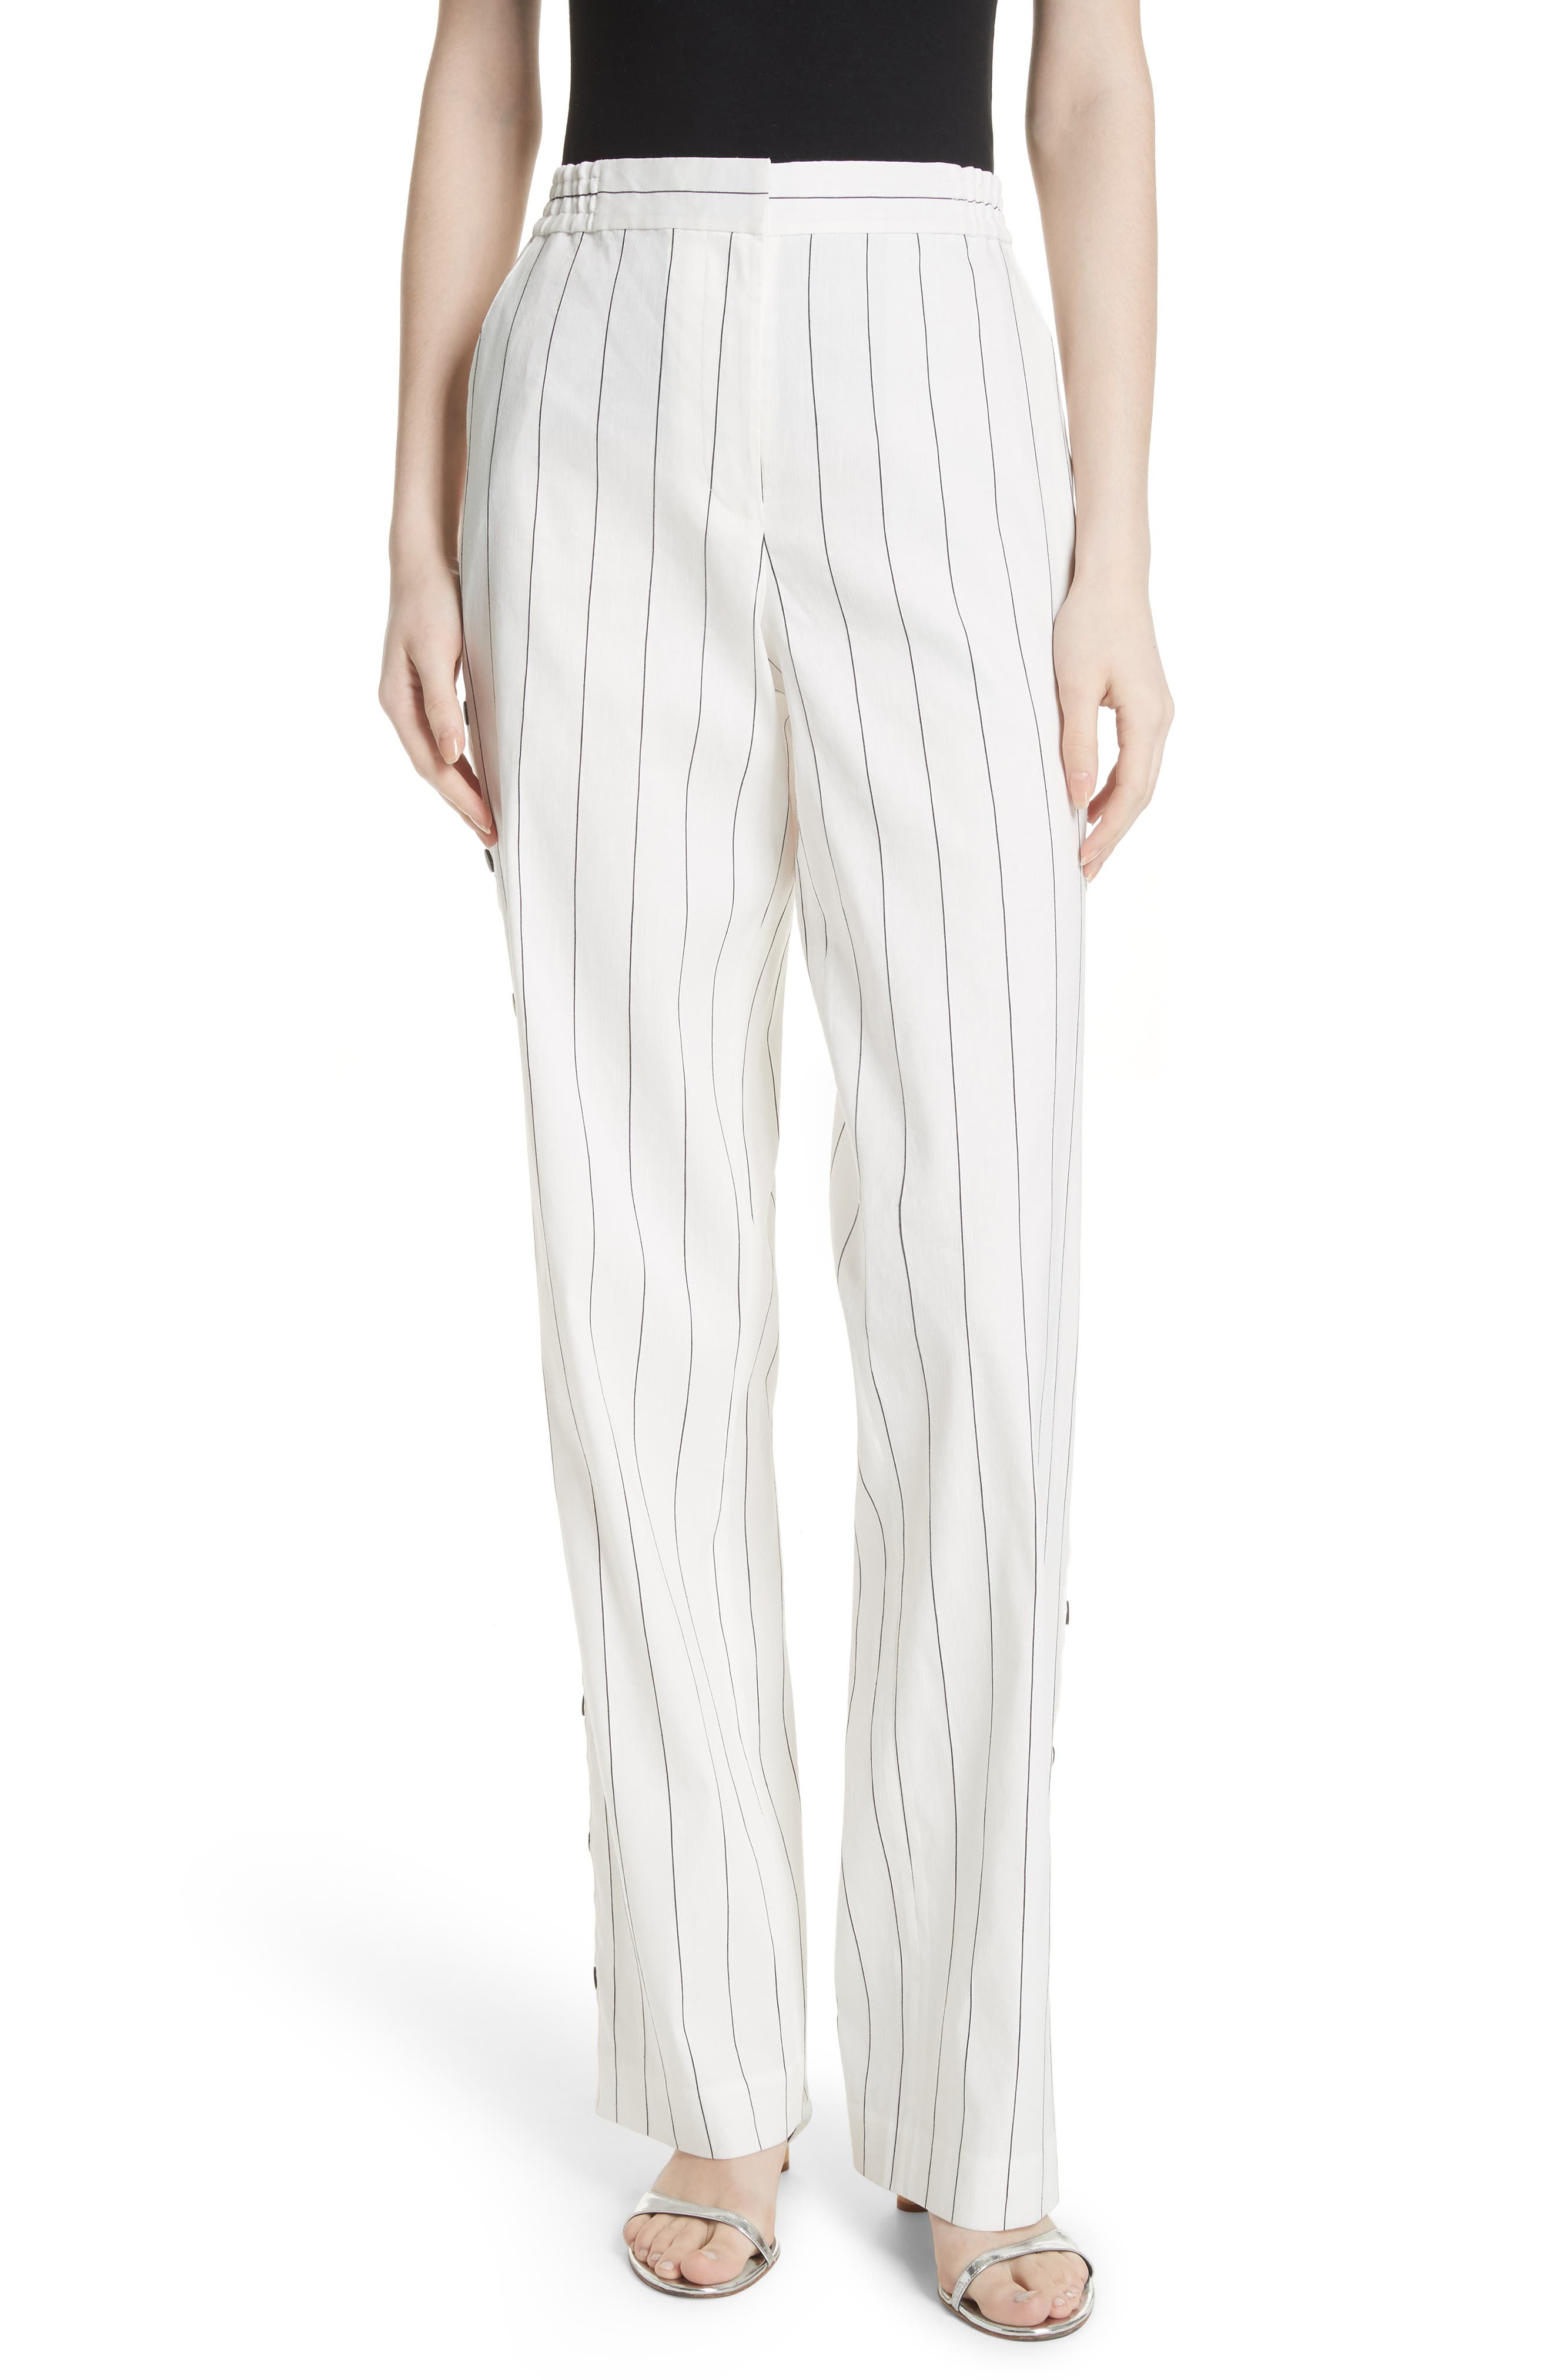 Snap Side Stripe Pants,                             Main thumbnail 1, color,                             907